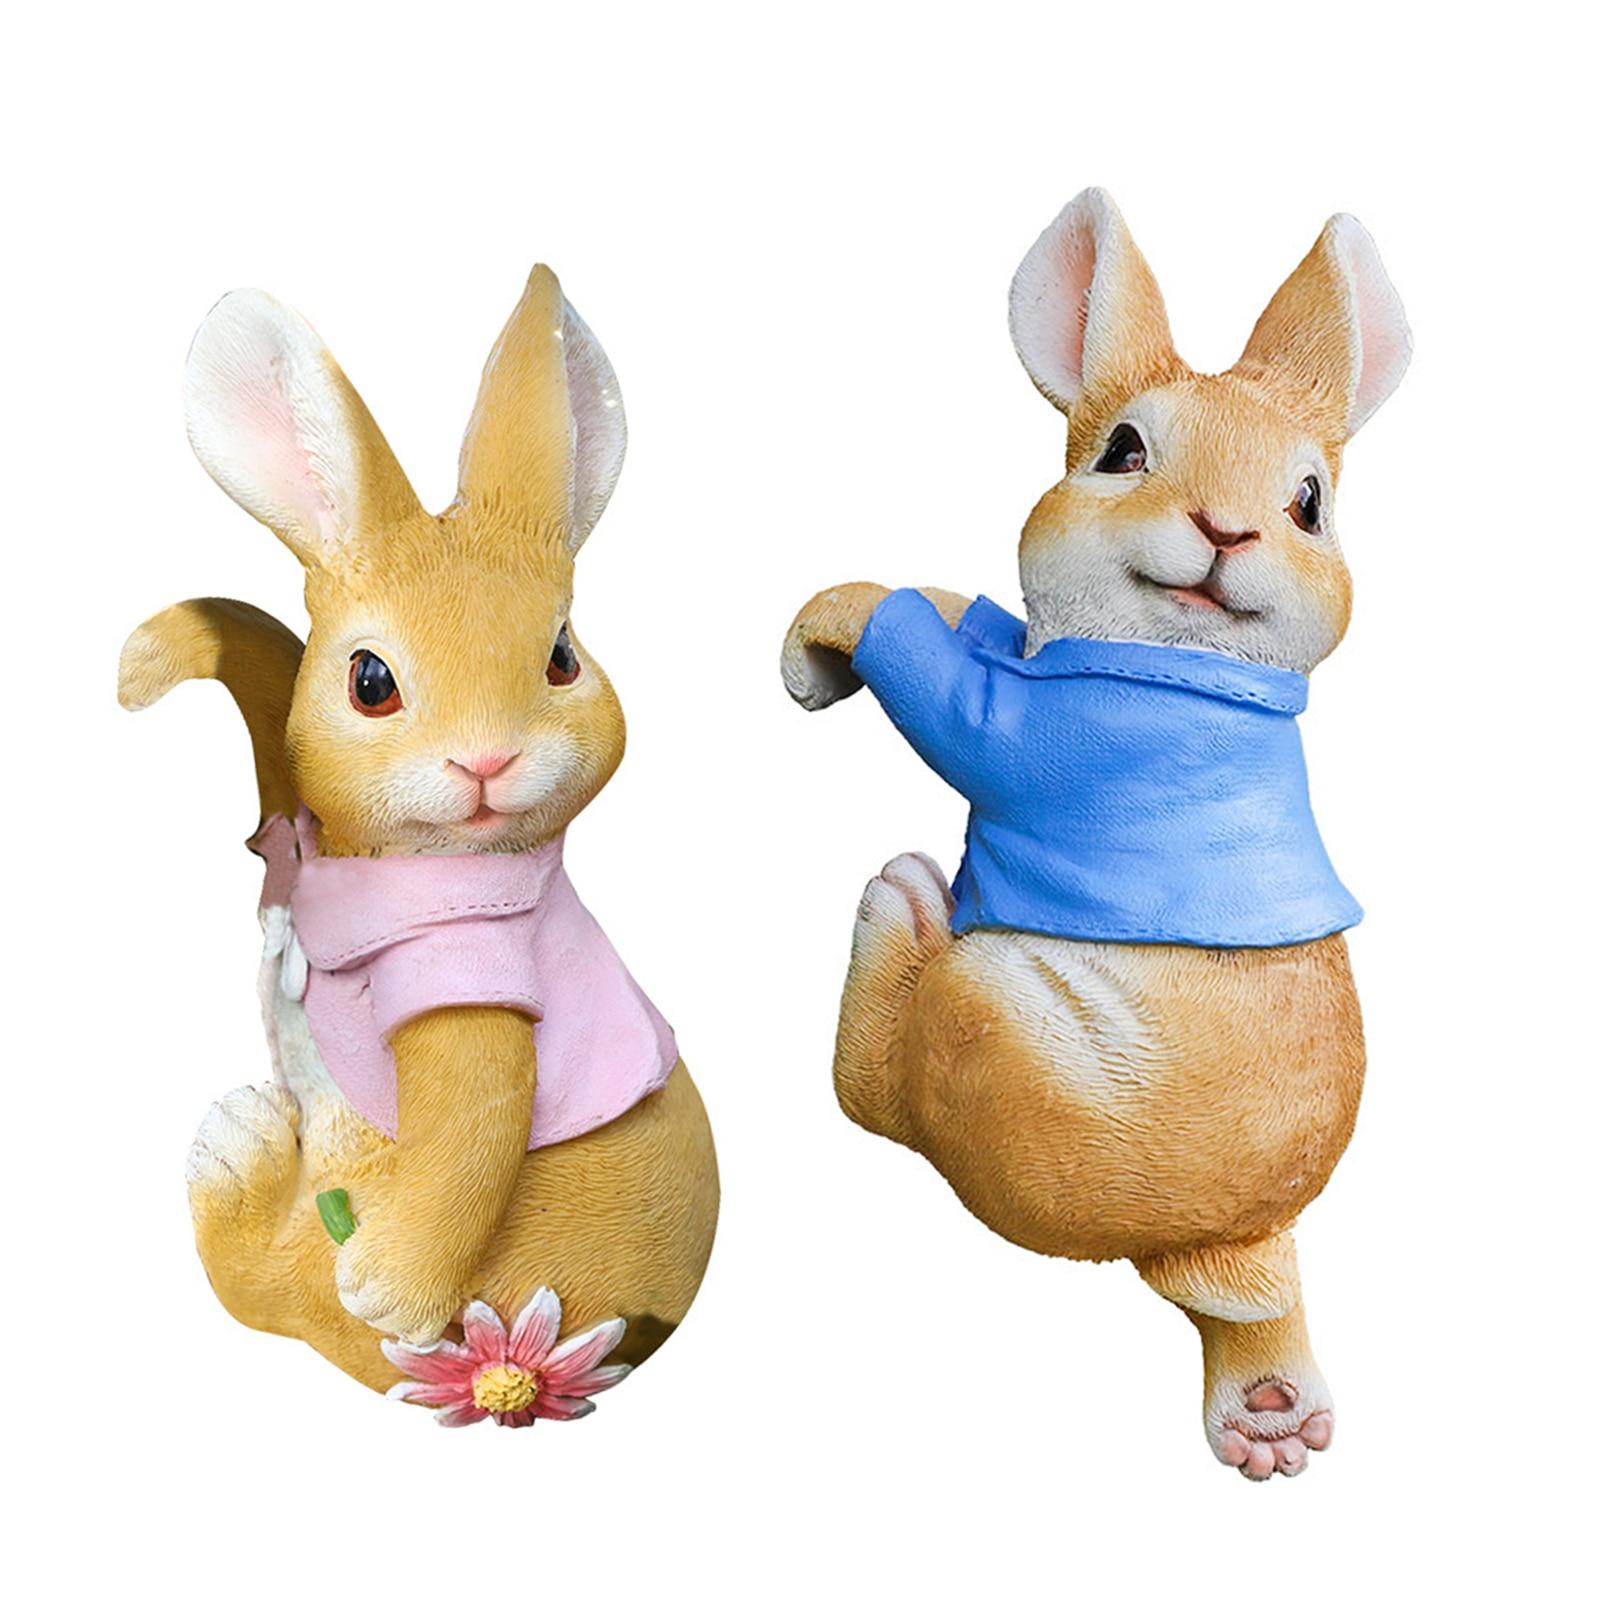 Fun Animal Rabbit Decoration Resin Crafts Statues For Garden #W0 недорого